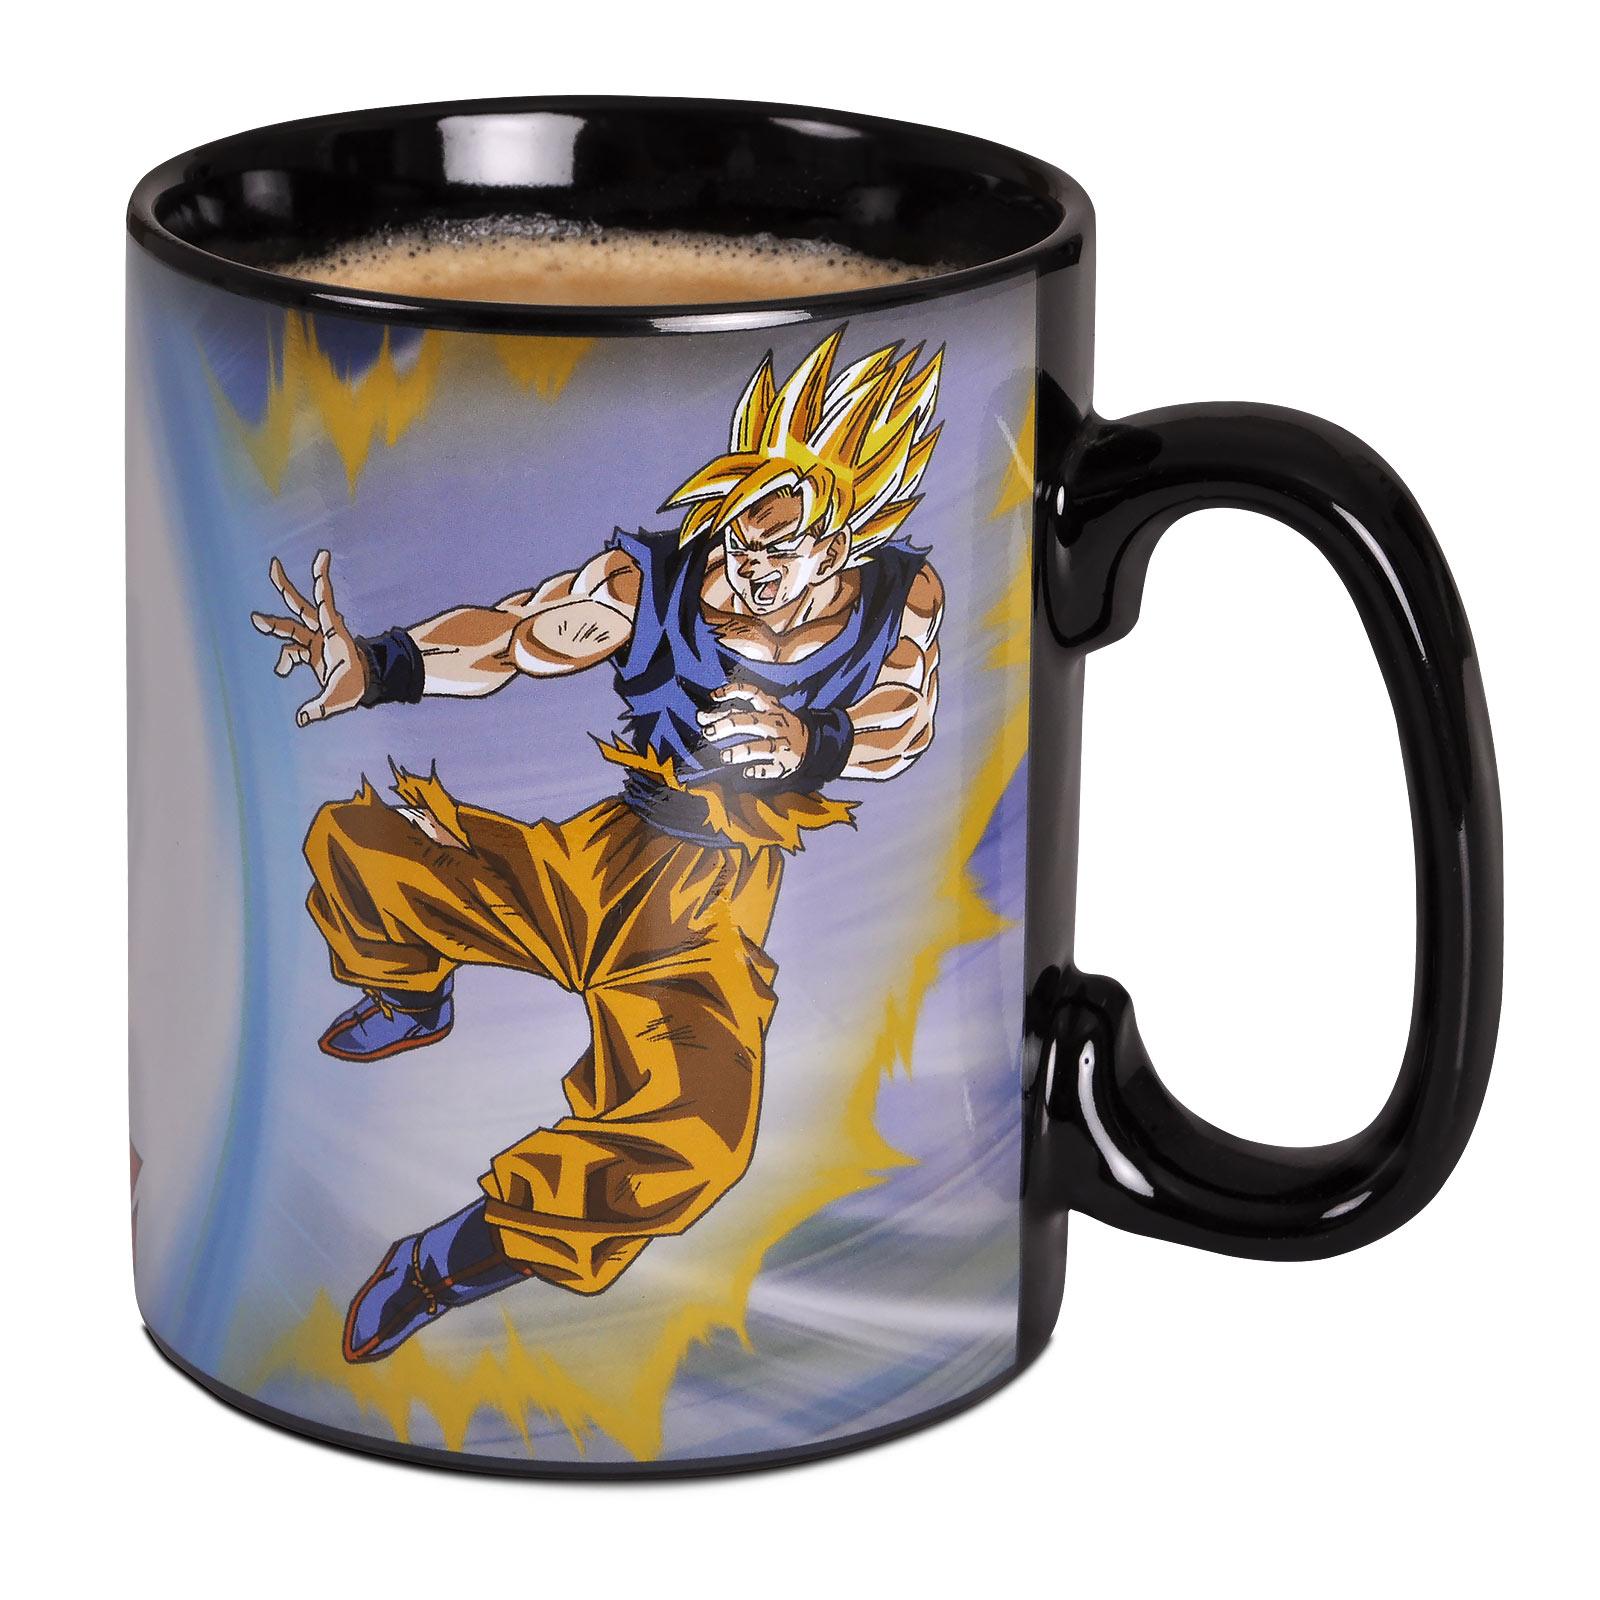 Dragon Ball Z - Goku vs. Buu Thermoeffekt Tasse